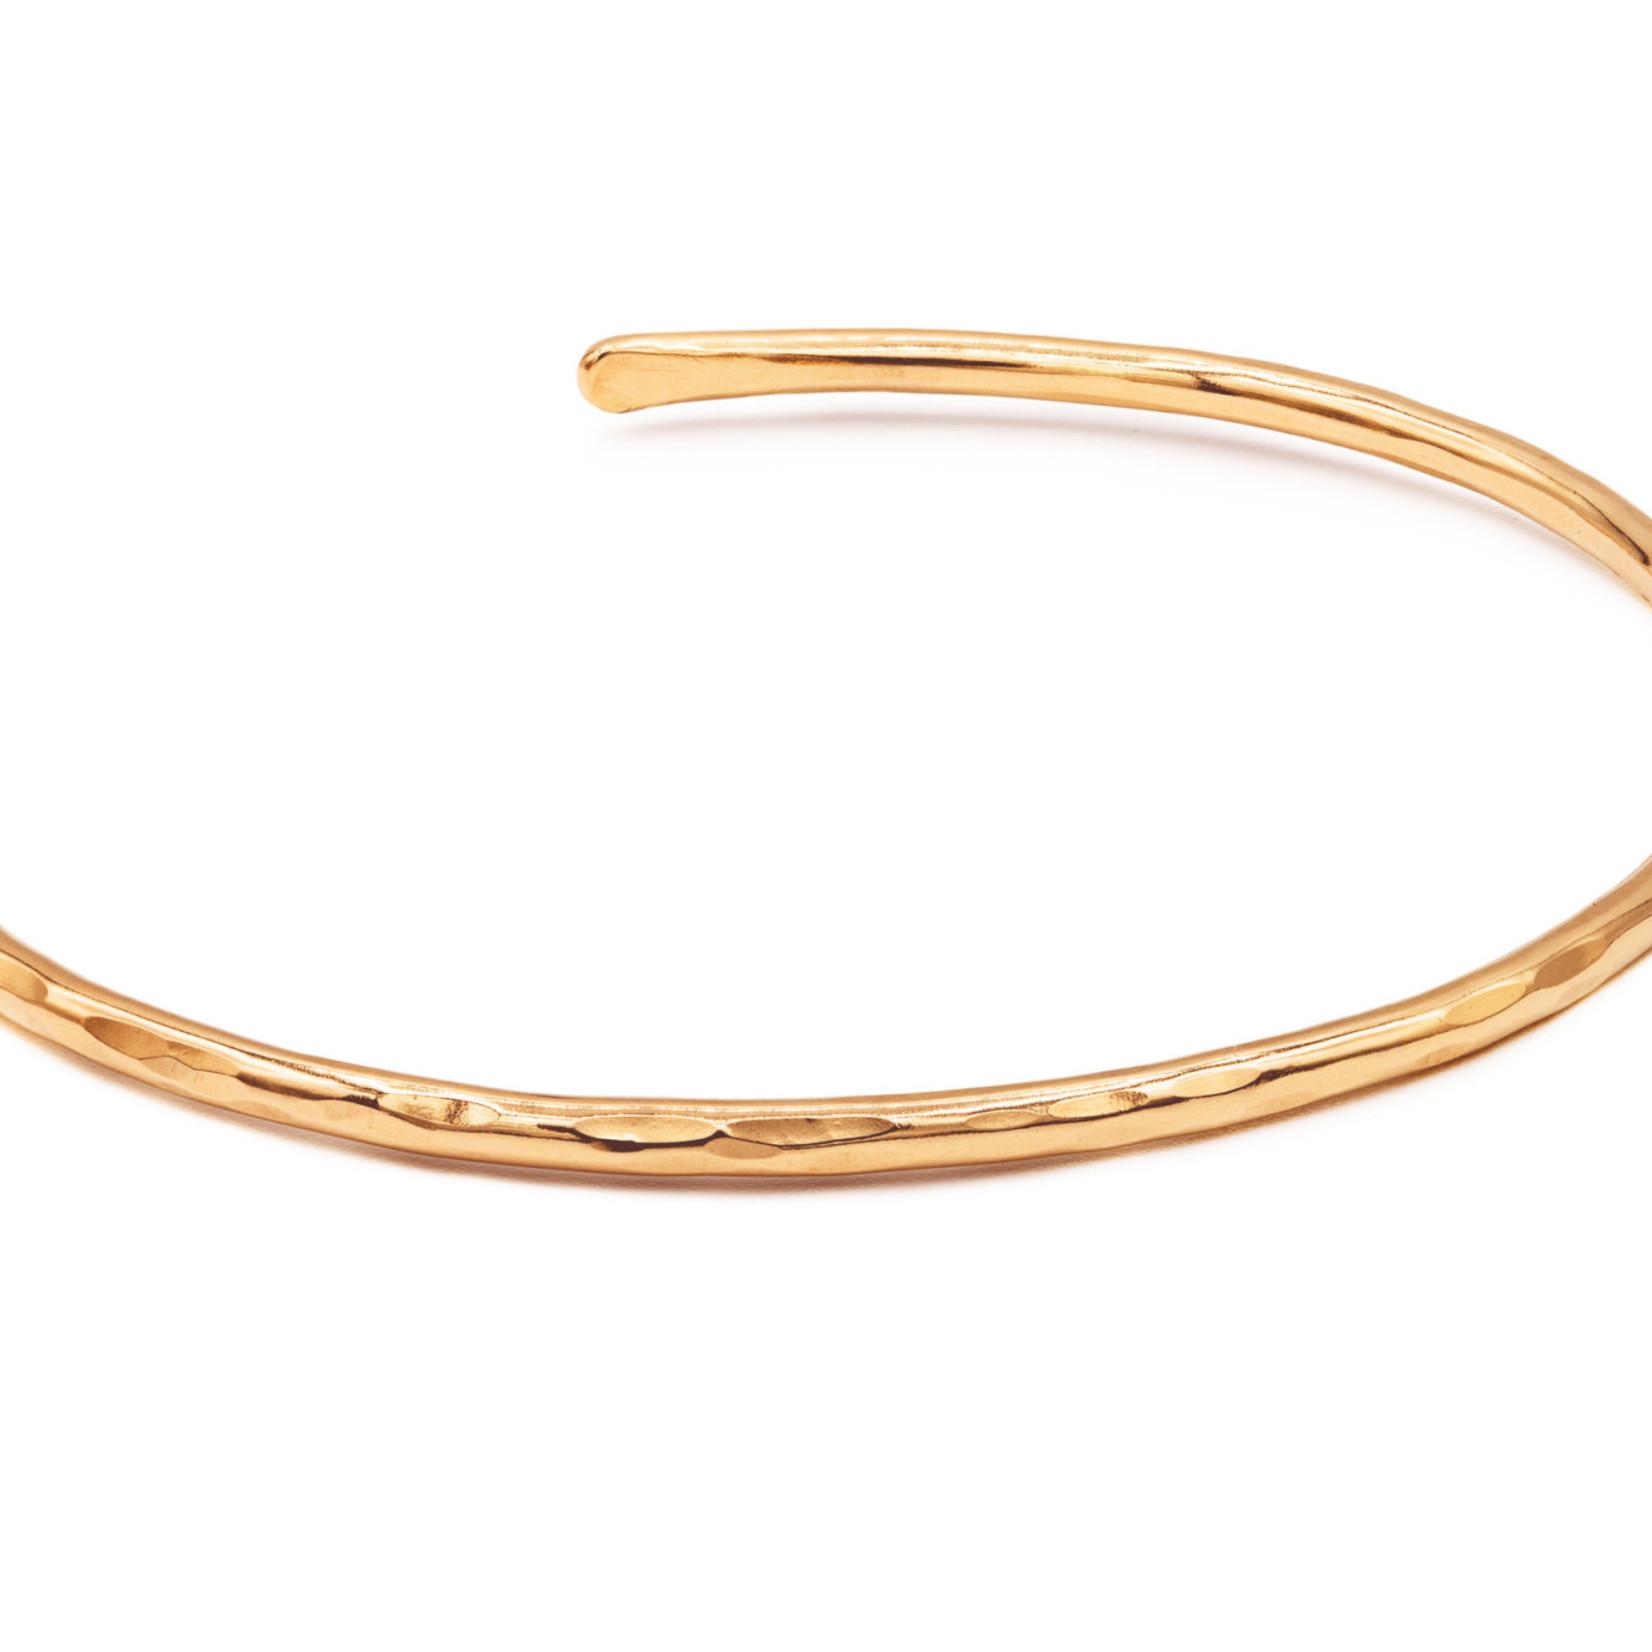 Mana Made Jewelry Mana Thin Cuff